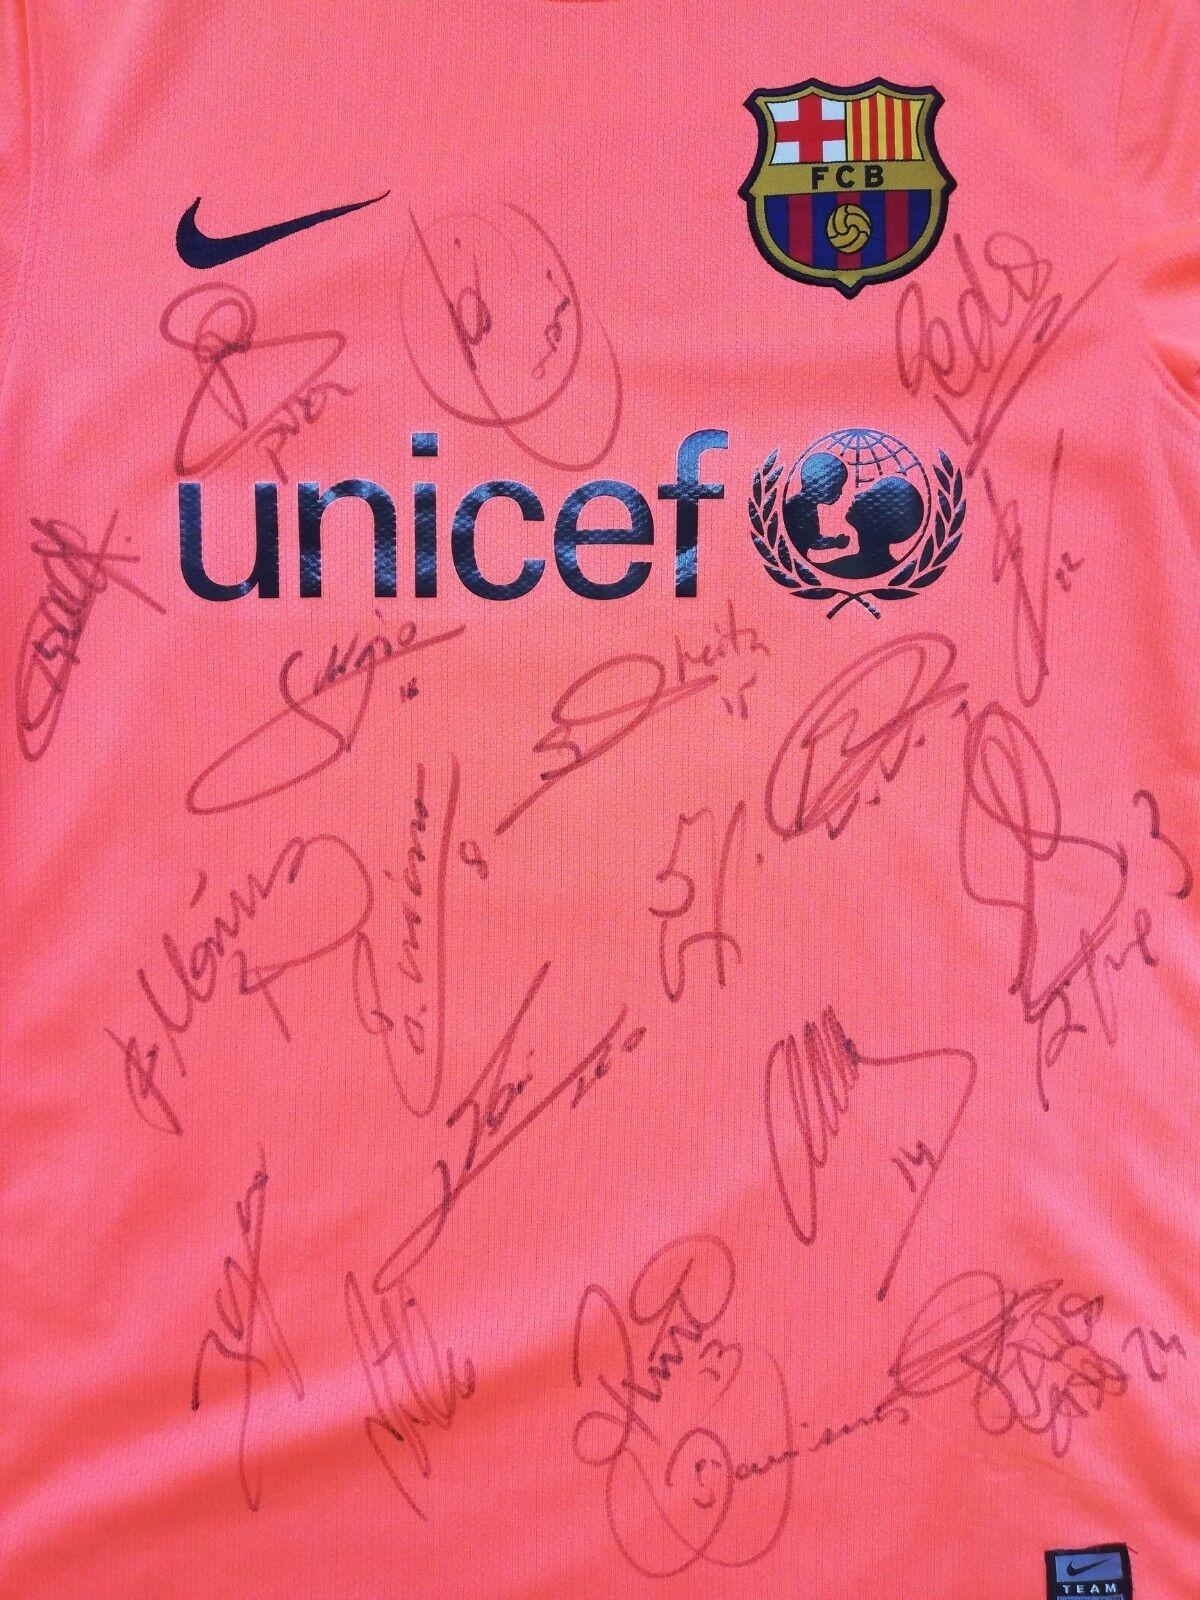 Barcelona 2009 10 signed oficial shirt maglia Ibrahimovic Messi Henry Guardiola